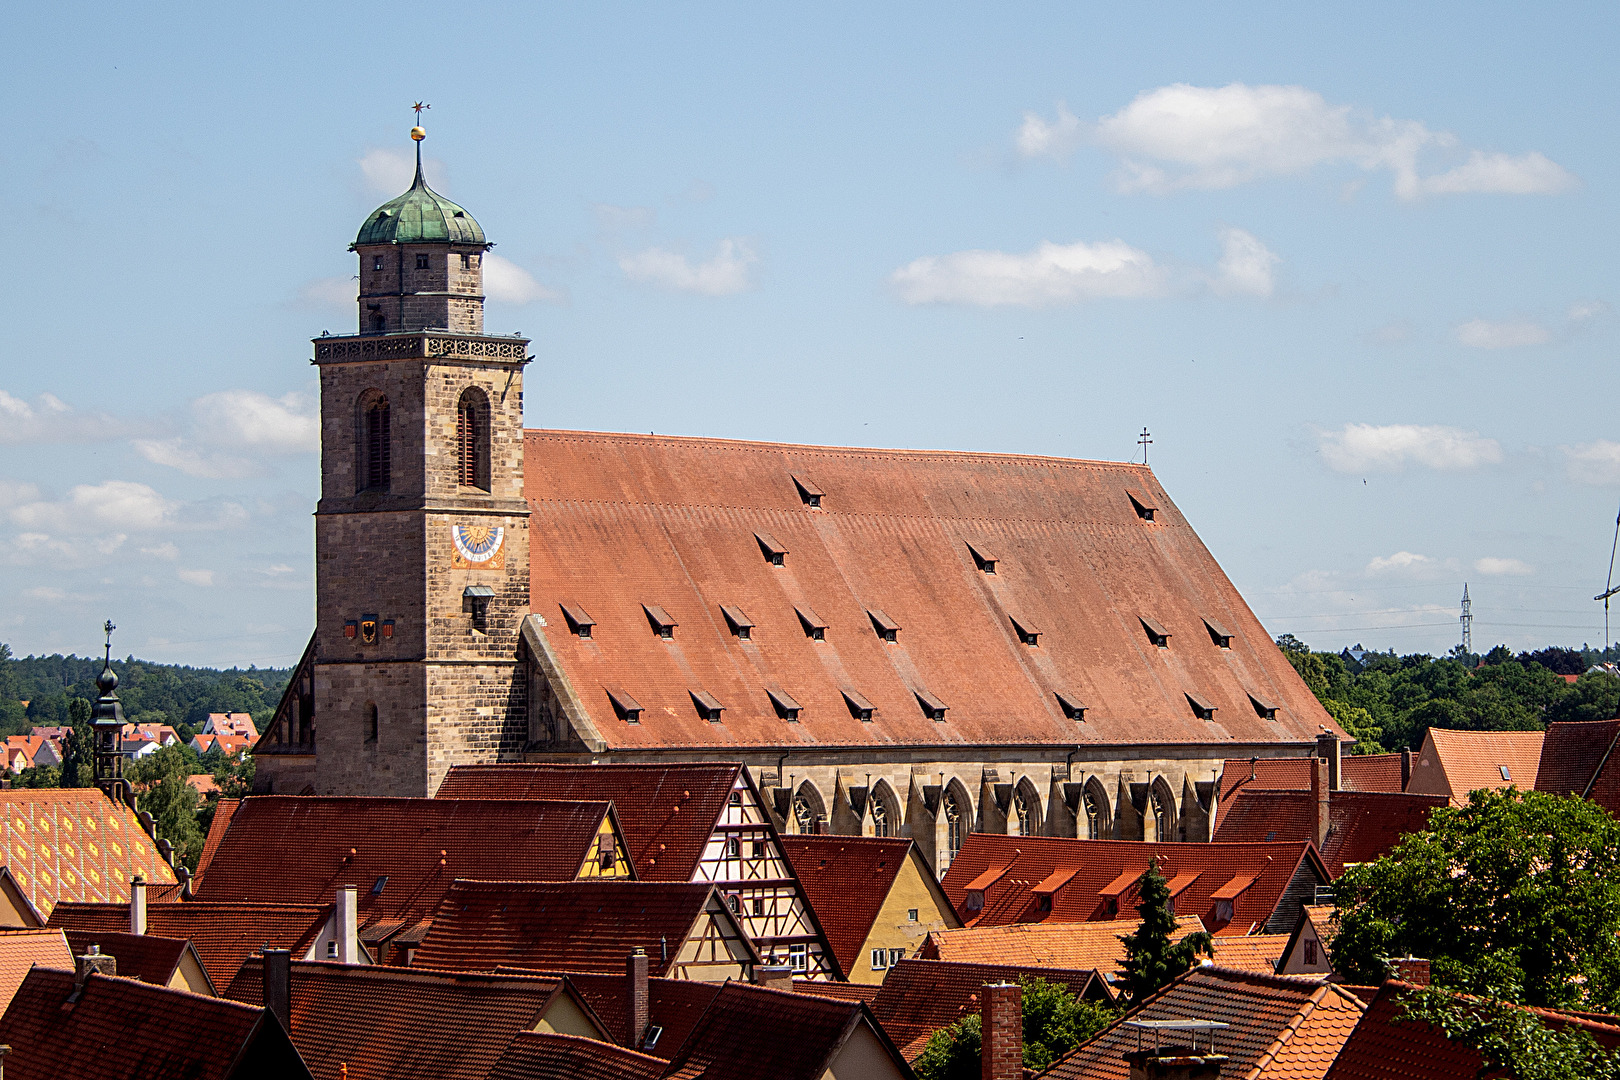 St. Georg in Dinkelsbühl